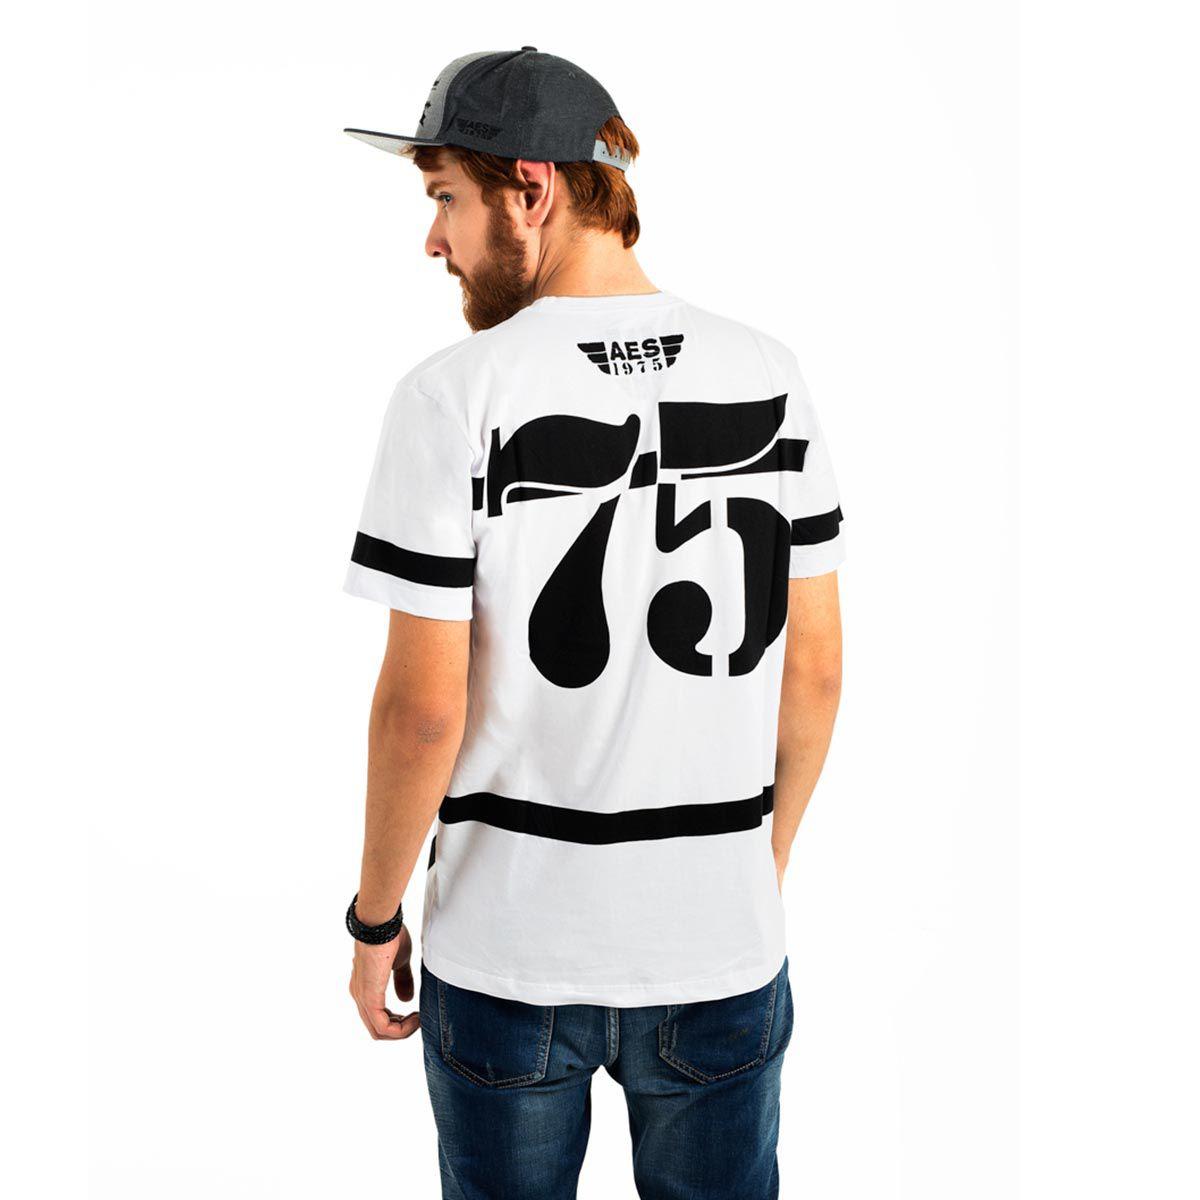 Camiseta AES 1975 Bronx